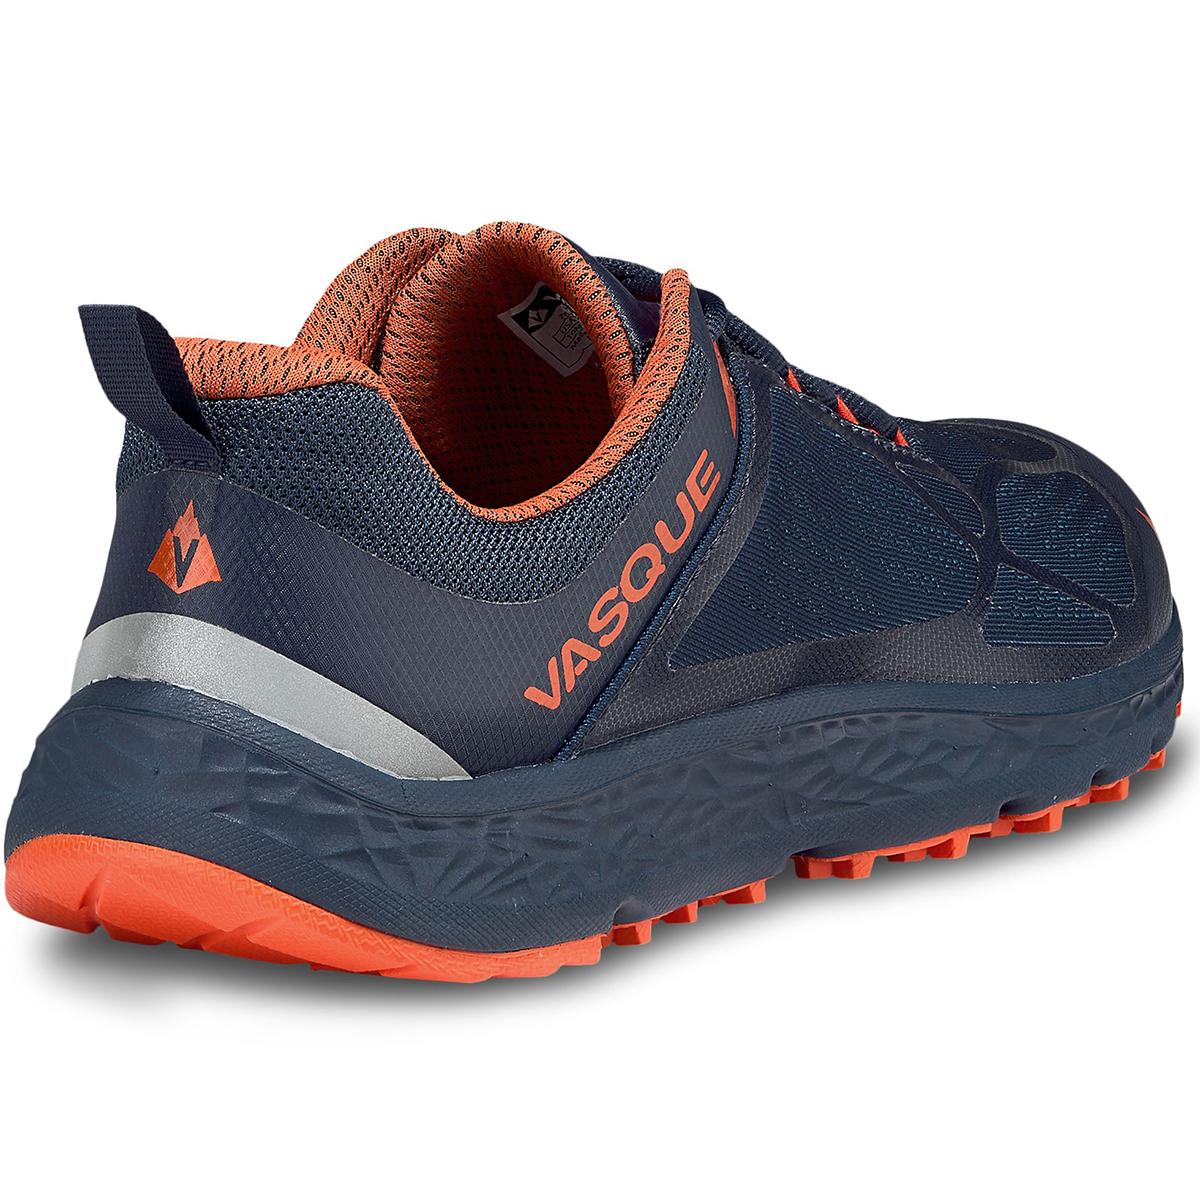 Velocity All Terrain Trail Running Shoe